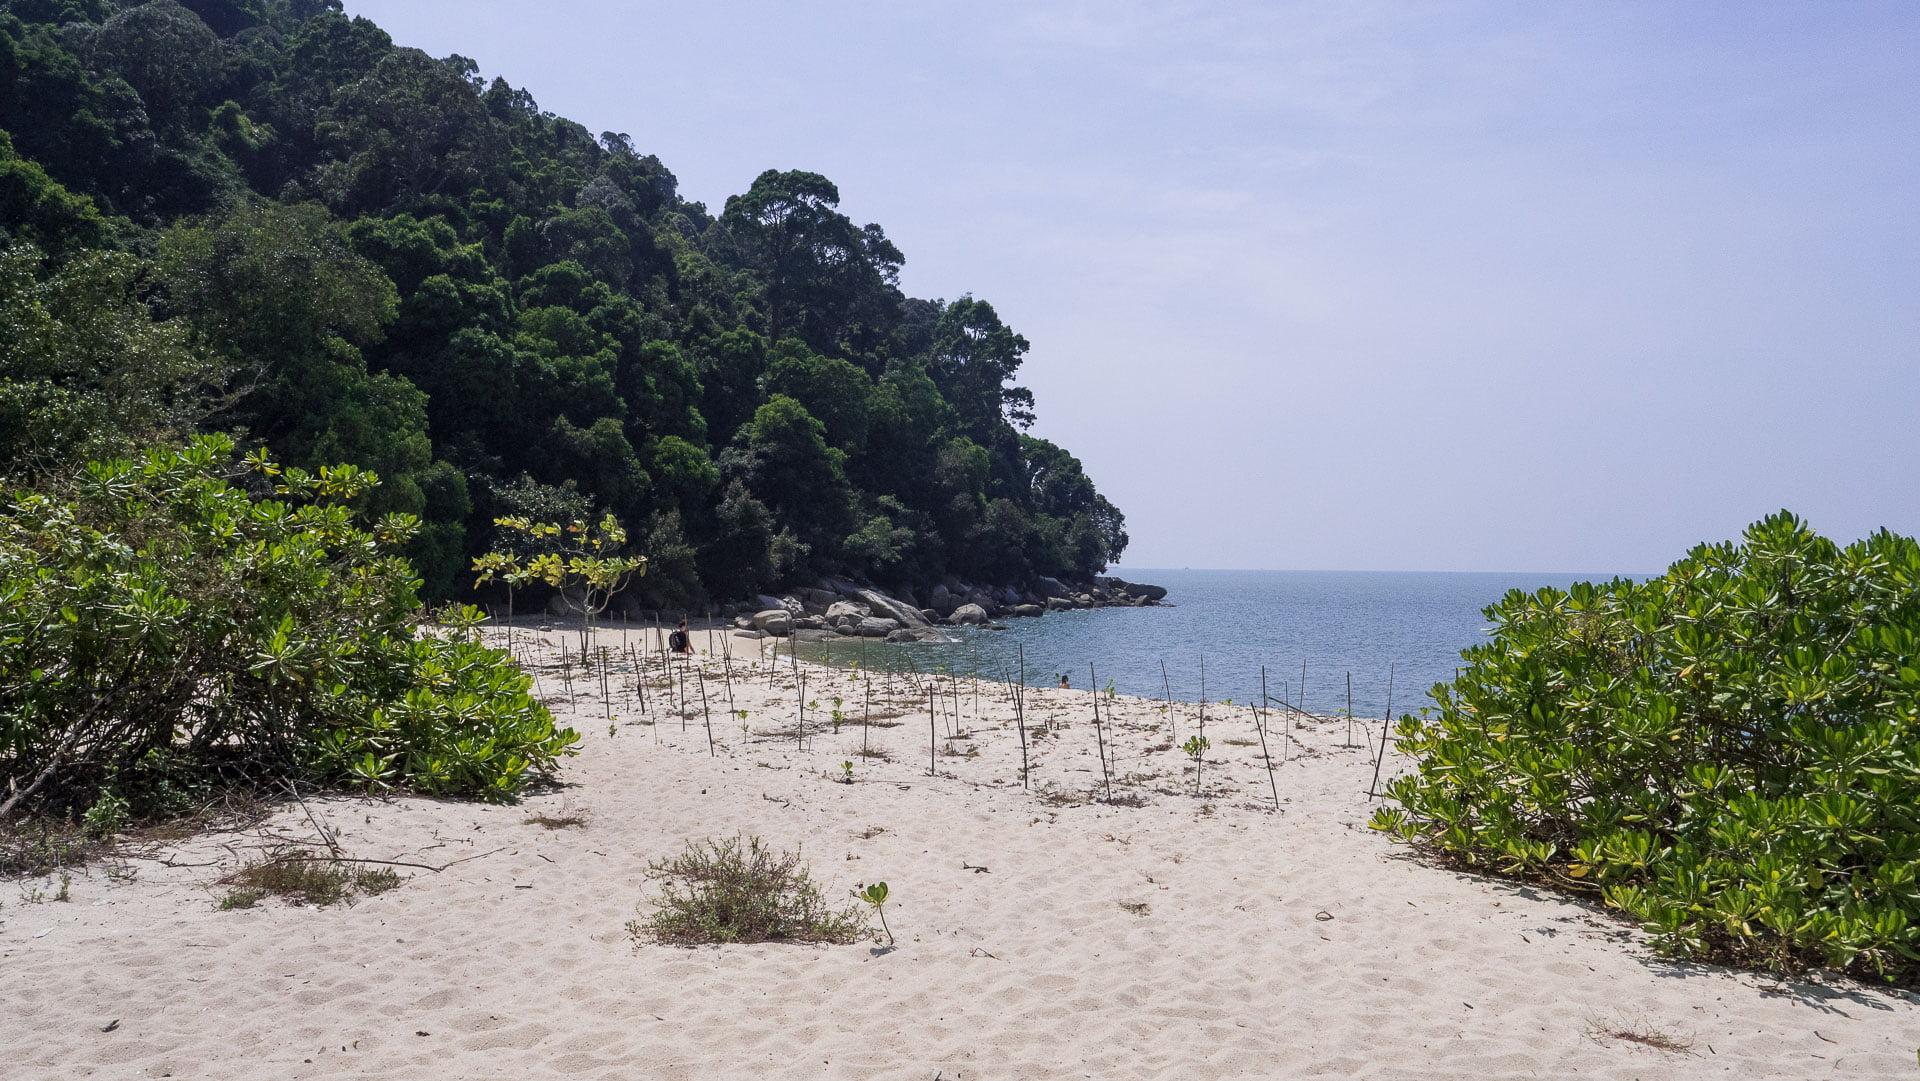 Penang parc naturel plage - Les globe blogueurs - blog voyage nature